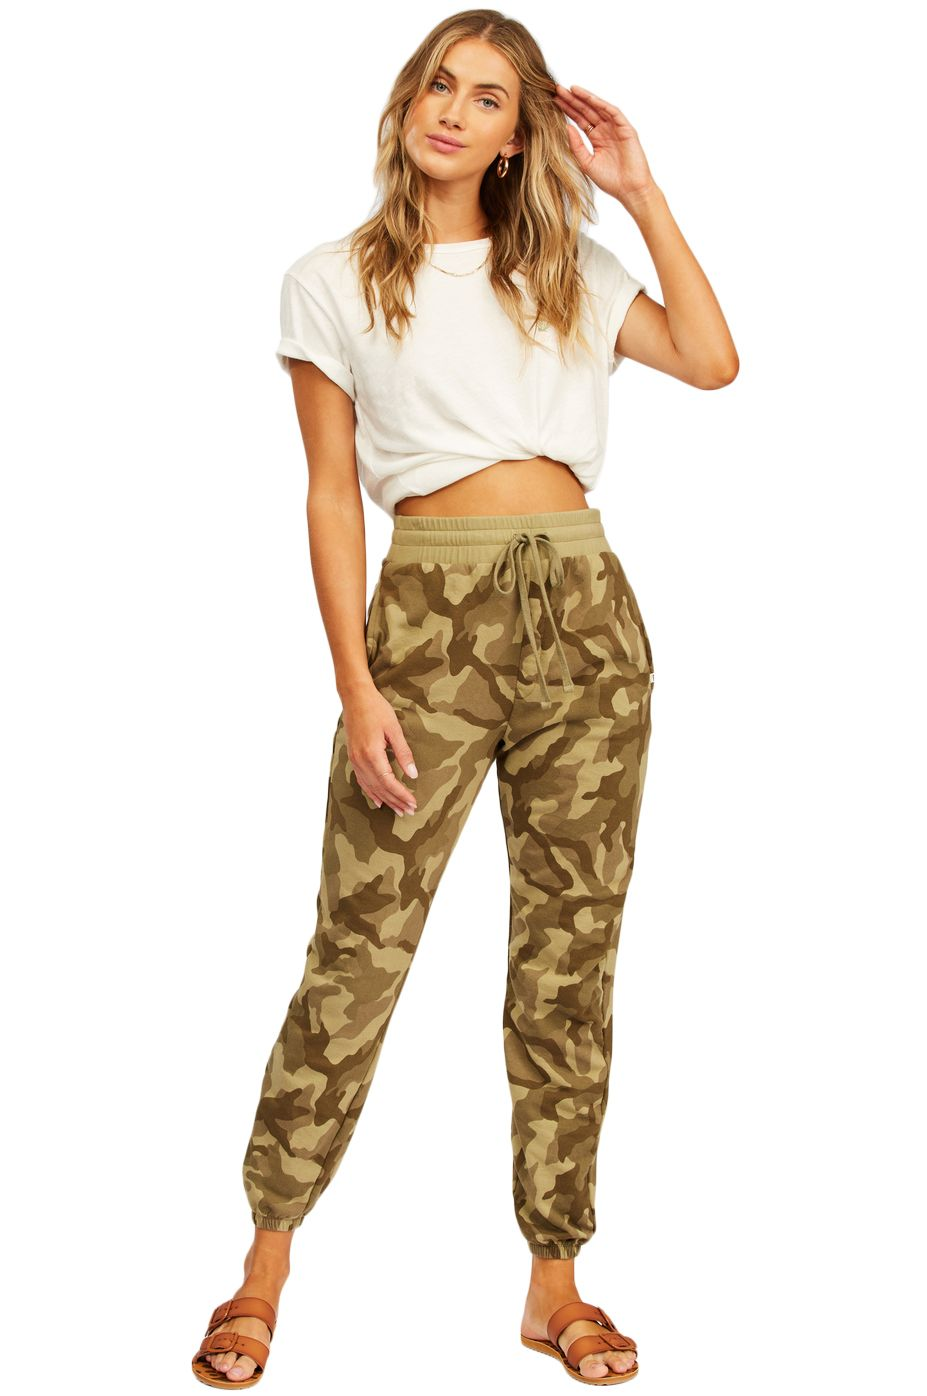 Billabong Pants CASUAL COAST PRINT COASTAL LOVE LETTERS Trooper